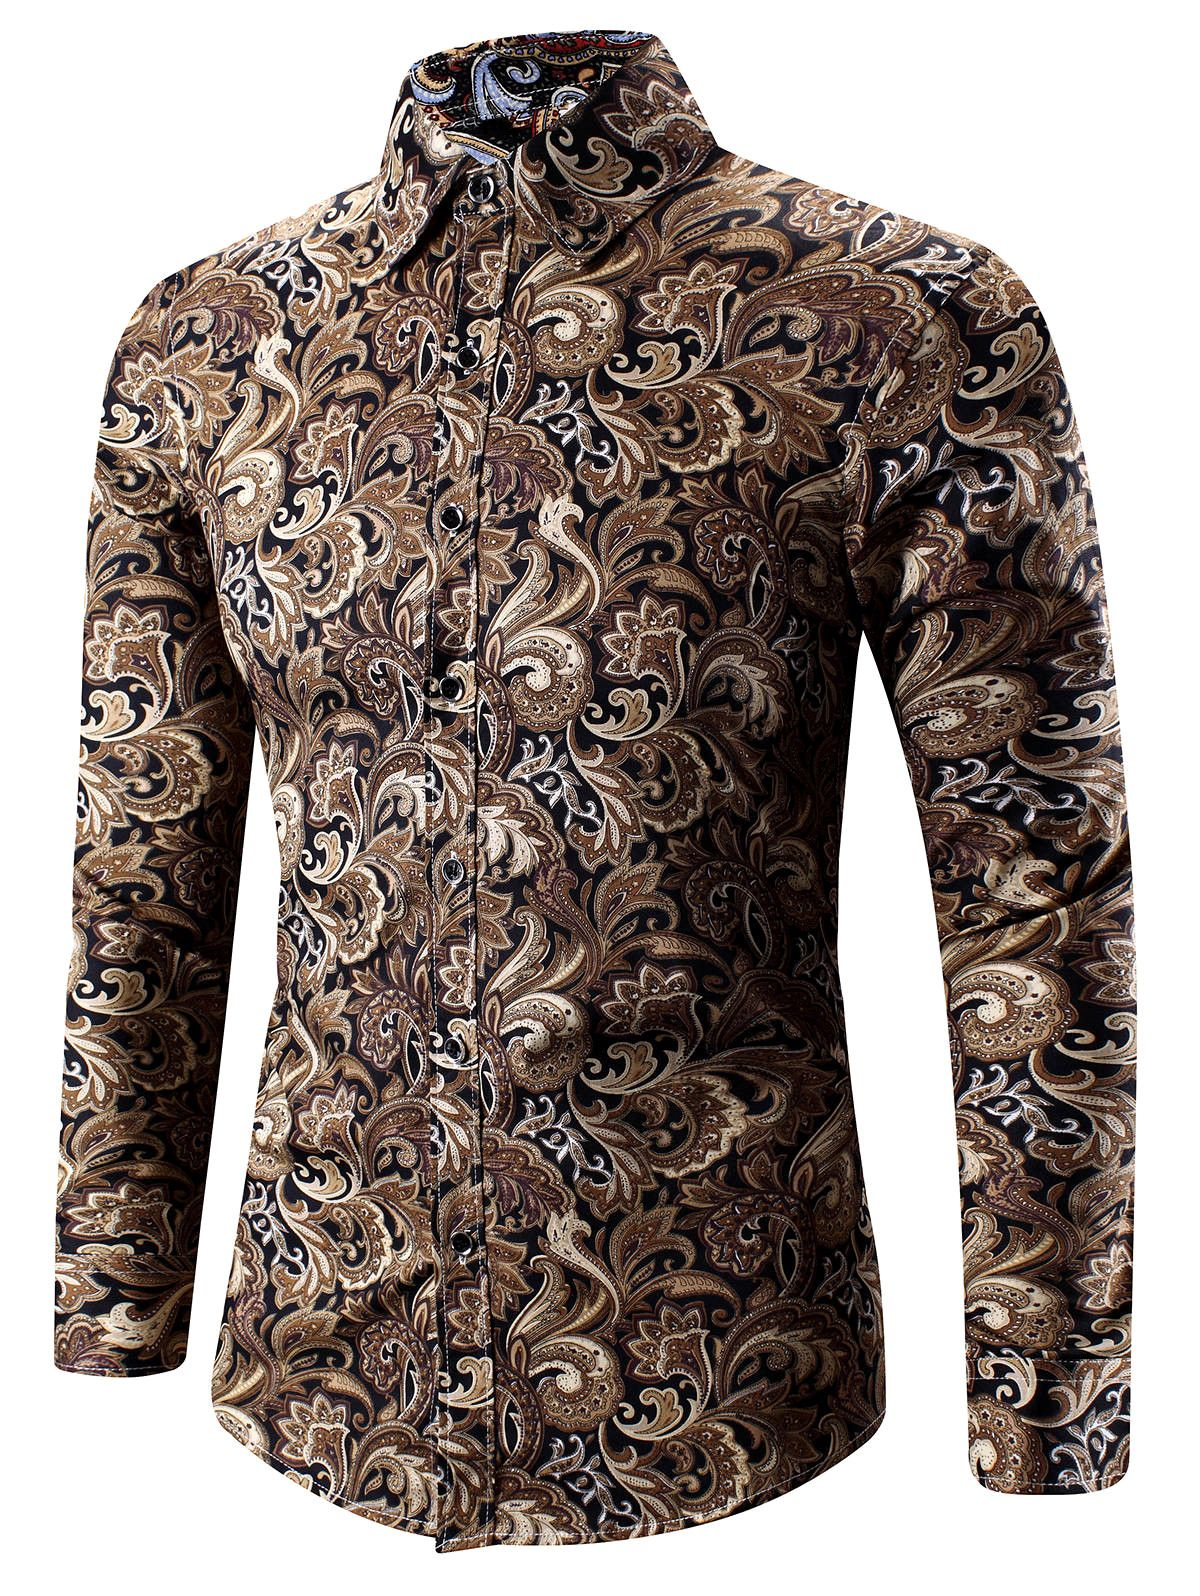 1698f06f3c $19.88 Turn-Down Collar 3D Paisley Print Shirt | Men casual ...